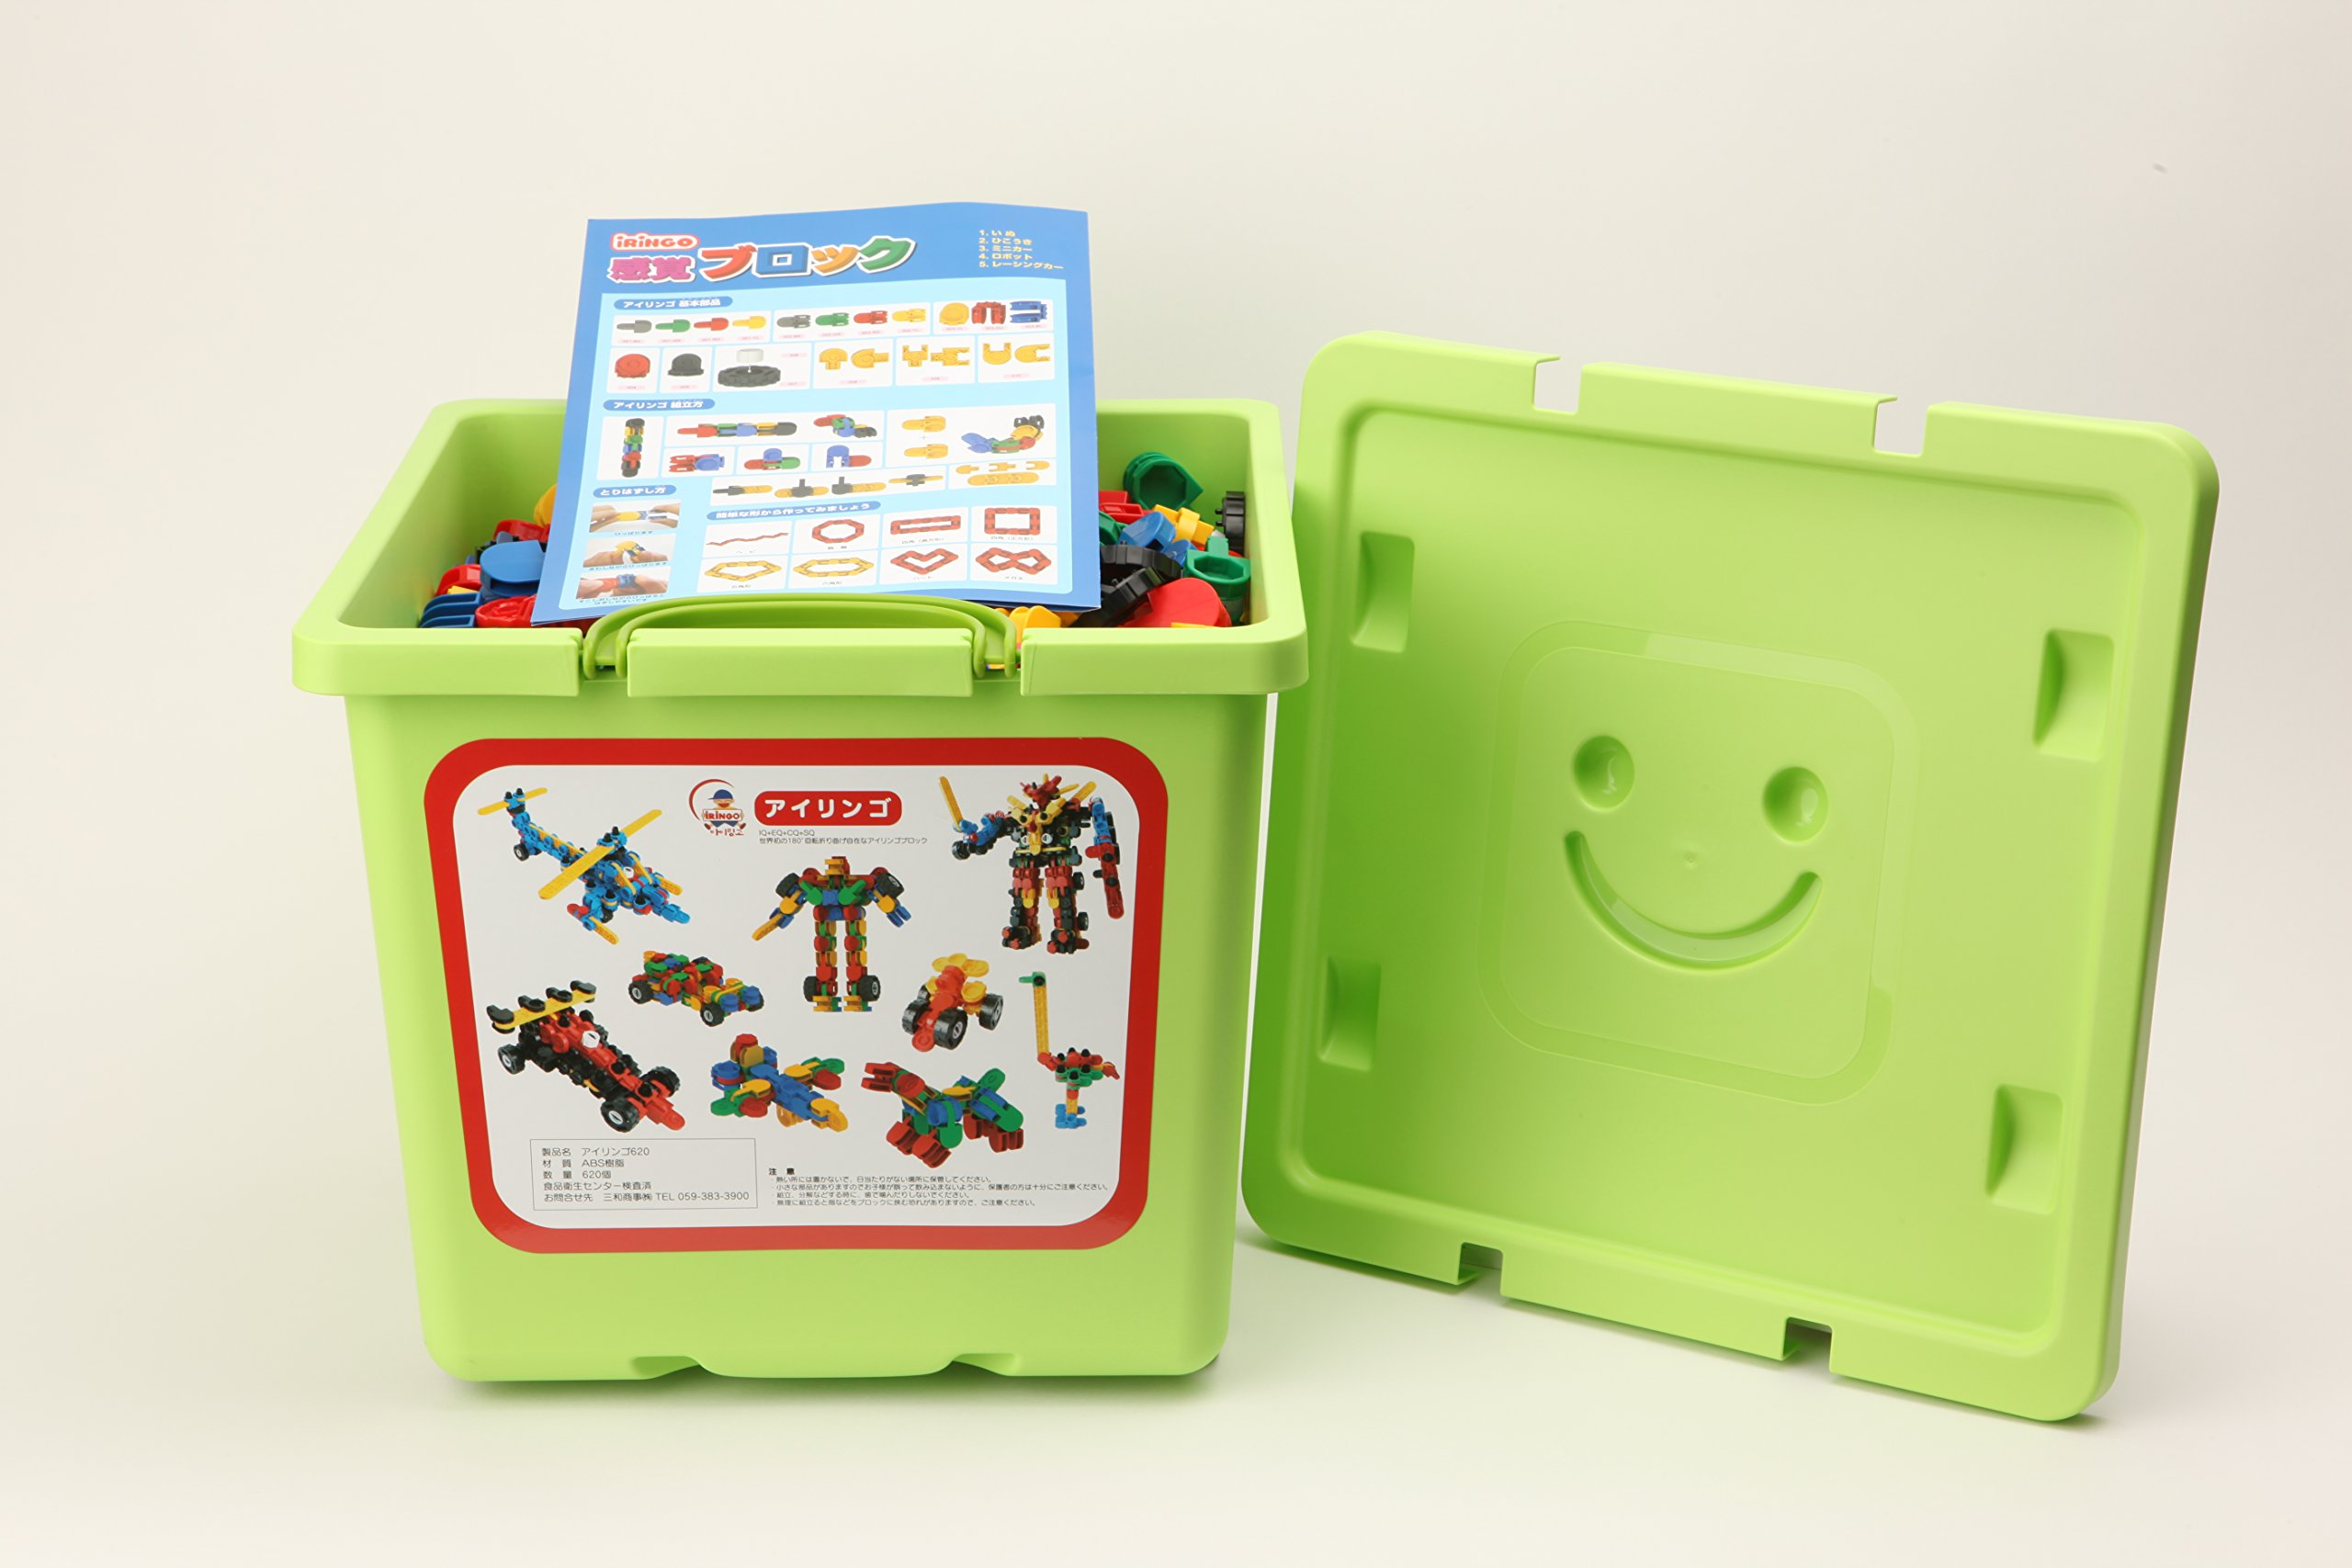 iRiNGO Airingo 620 educational toys block